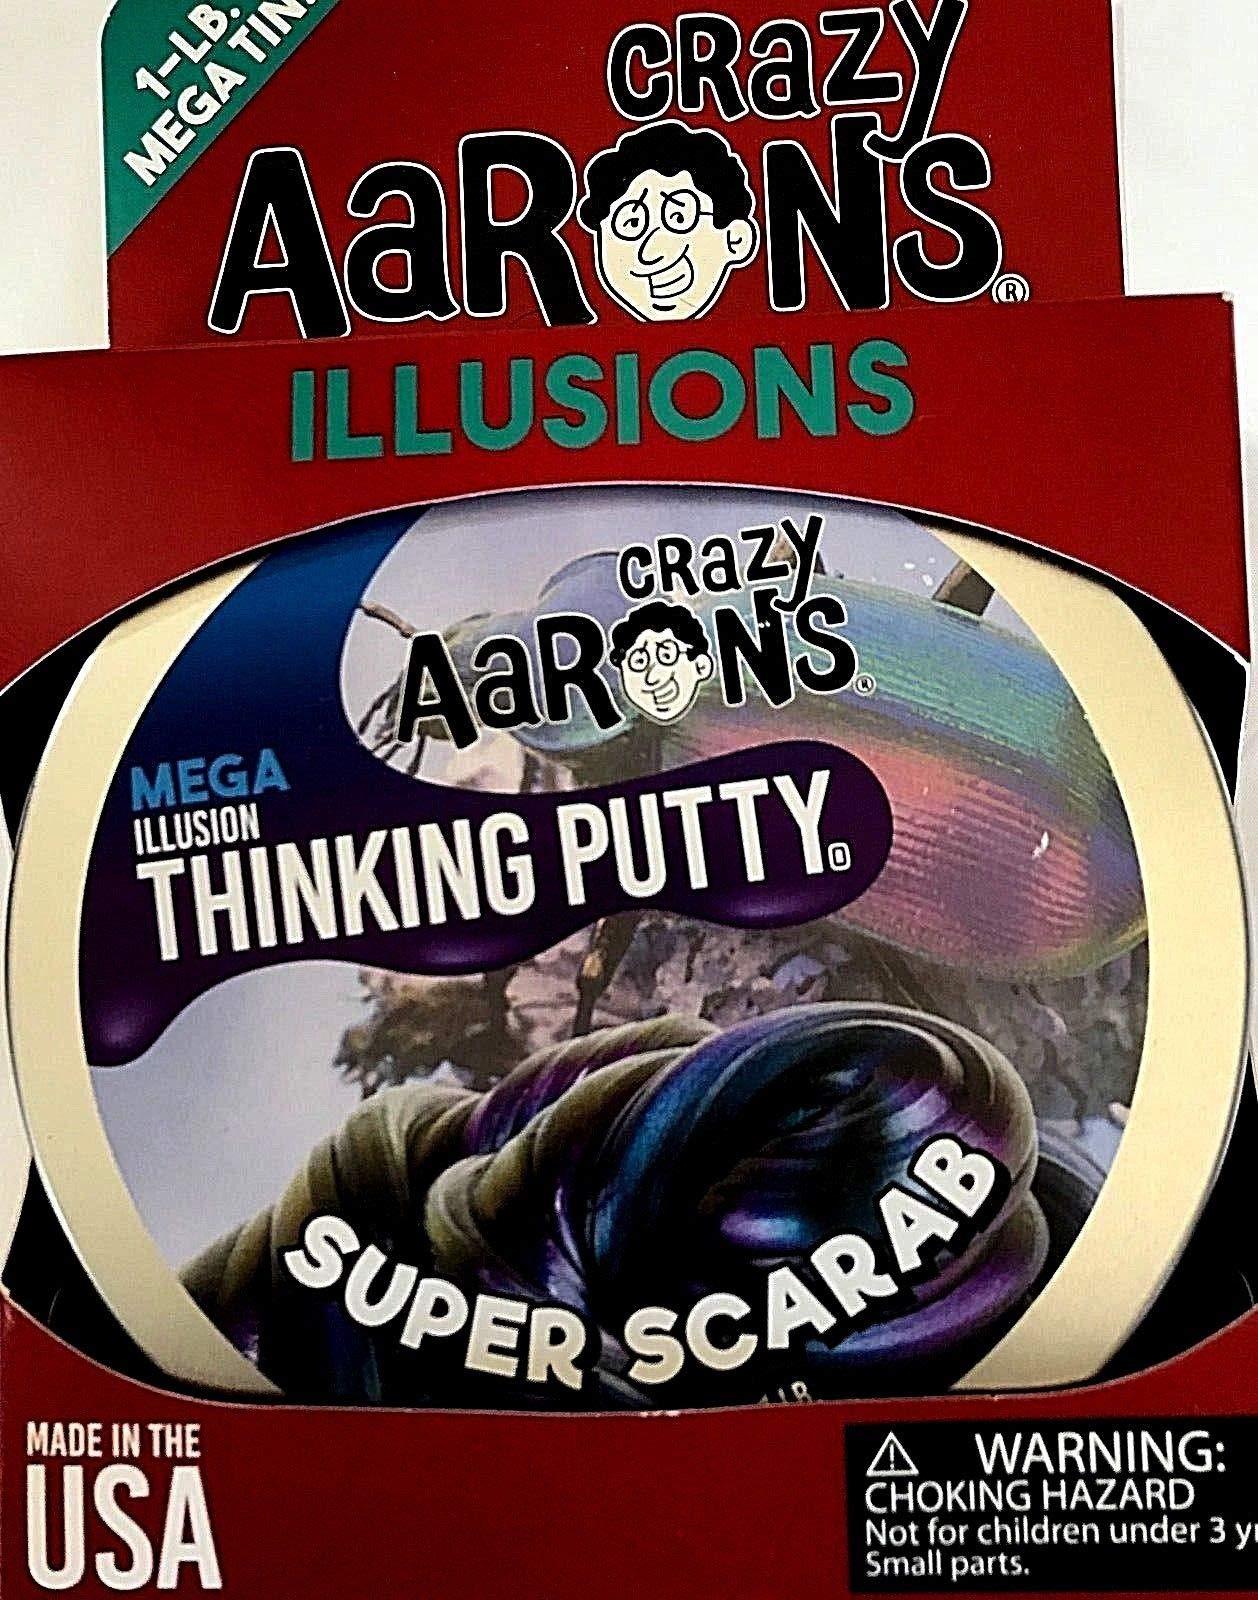 MEGA Super Scarab Illusion Crazy Aaron's Thinking Putty 1 Pound (LB) of Putty, by Crazy Aaron's Thinking Putty (Image #4)